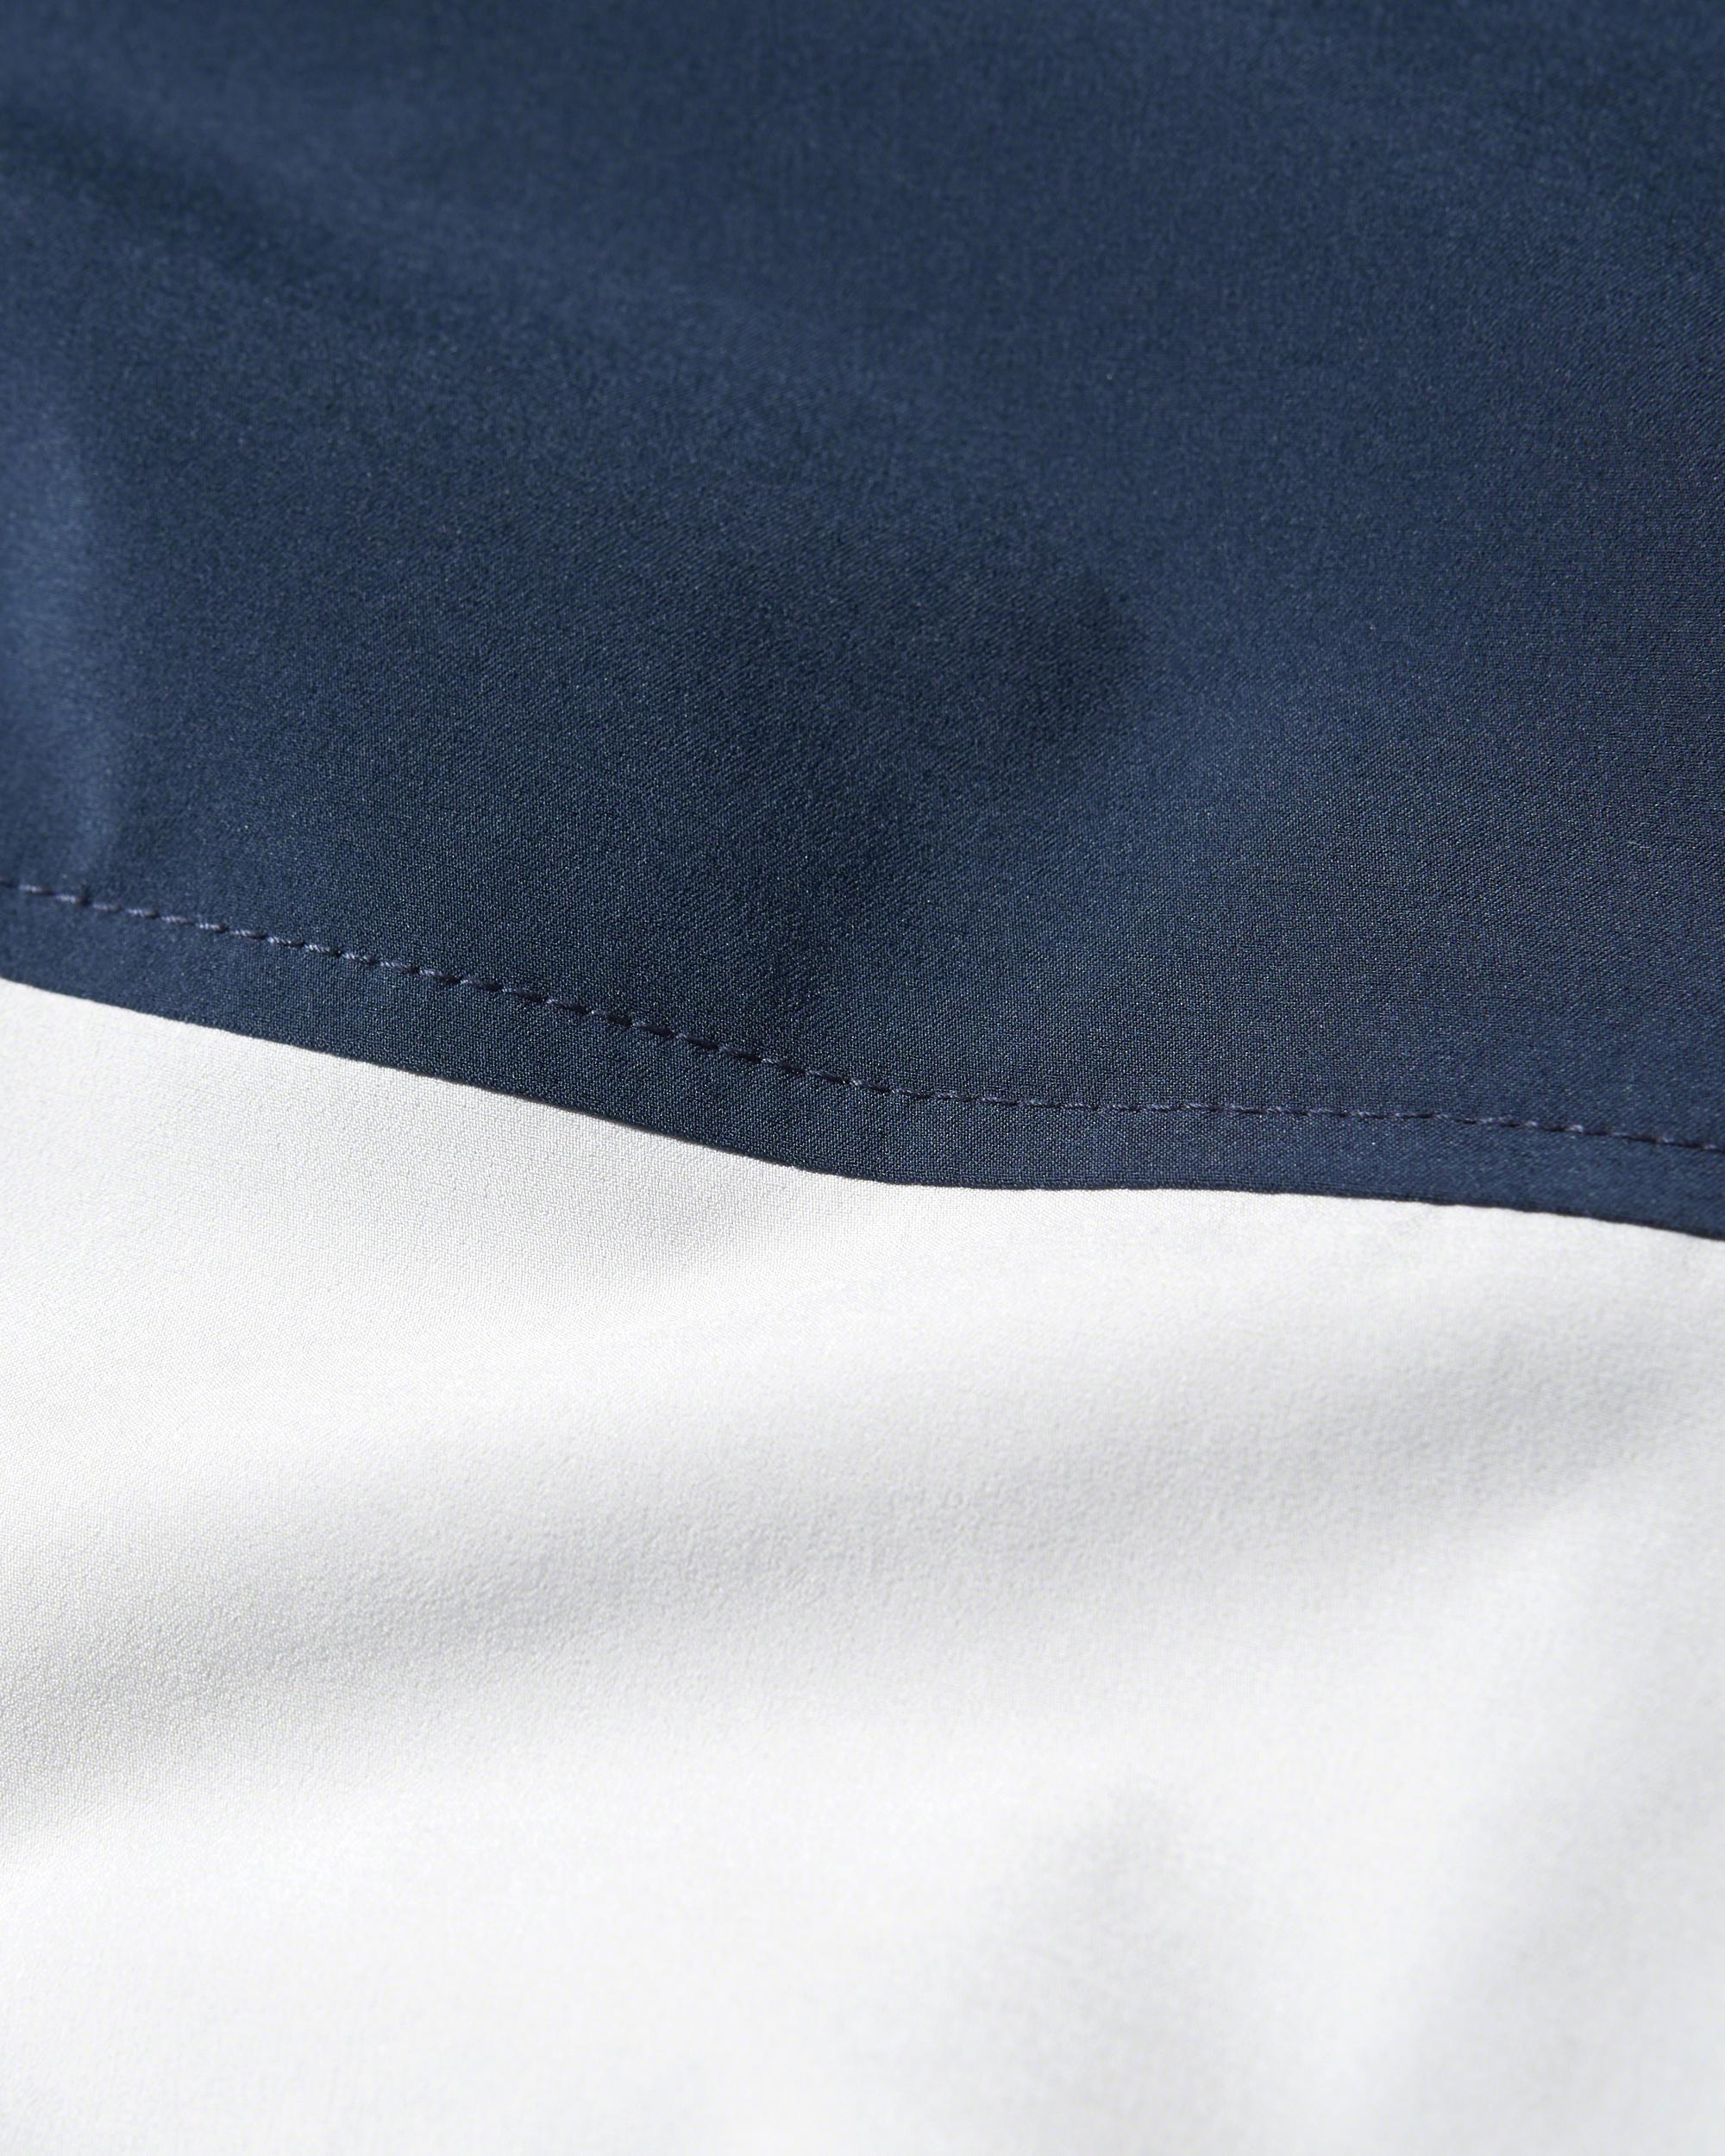 Hollister Synthetic Colorblock Nylon Windbreaker in Navy (Blue) for Men